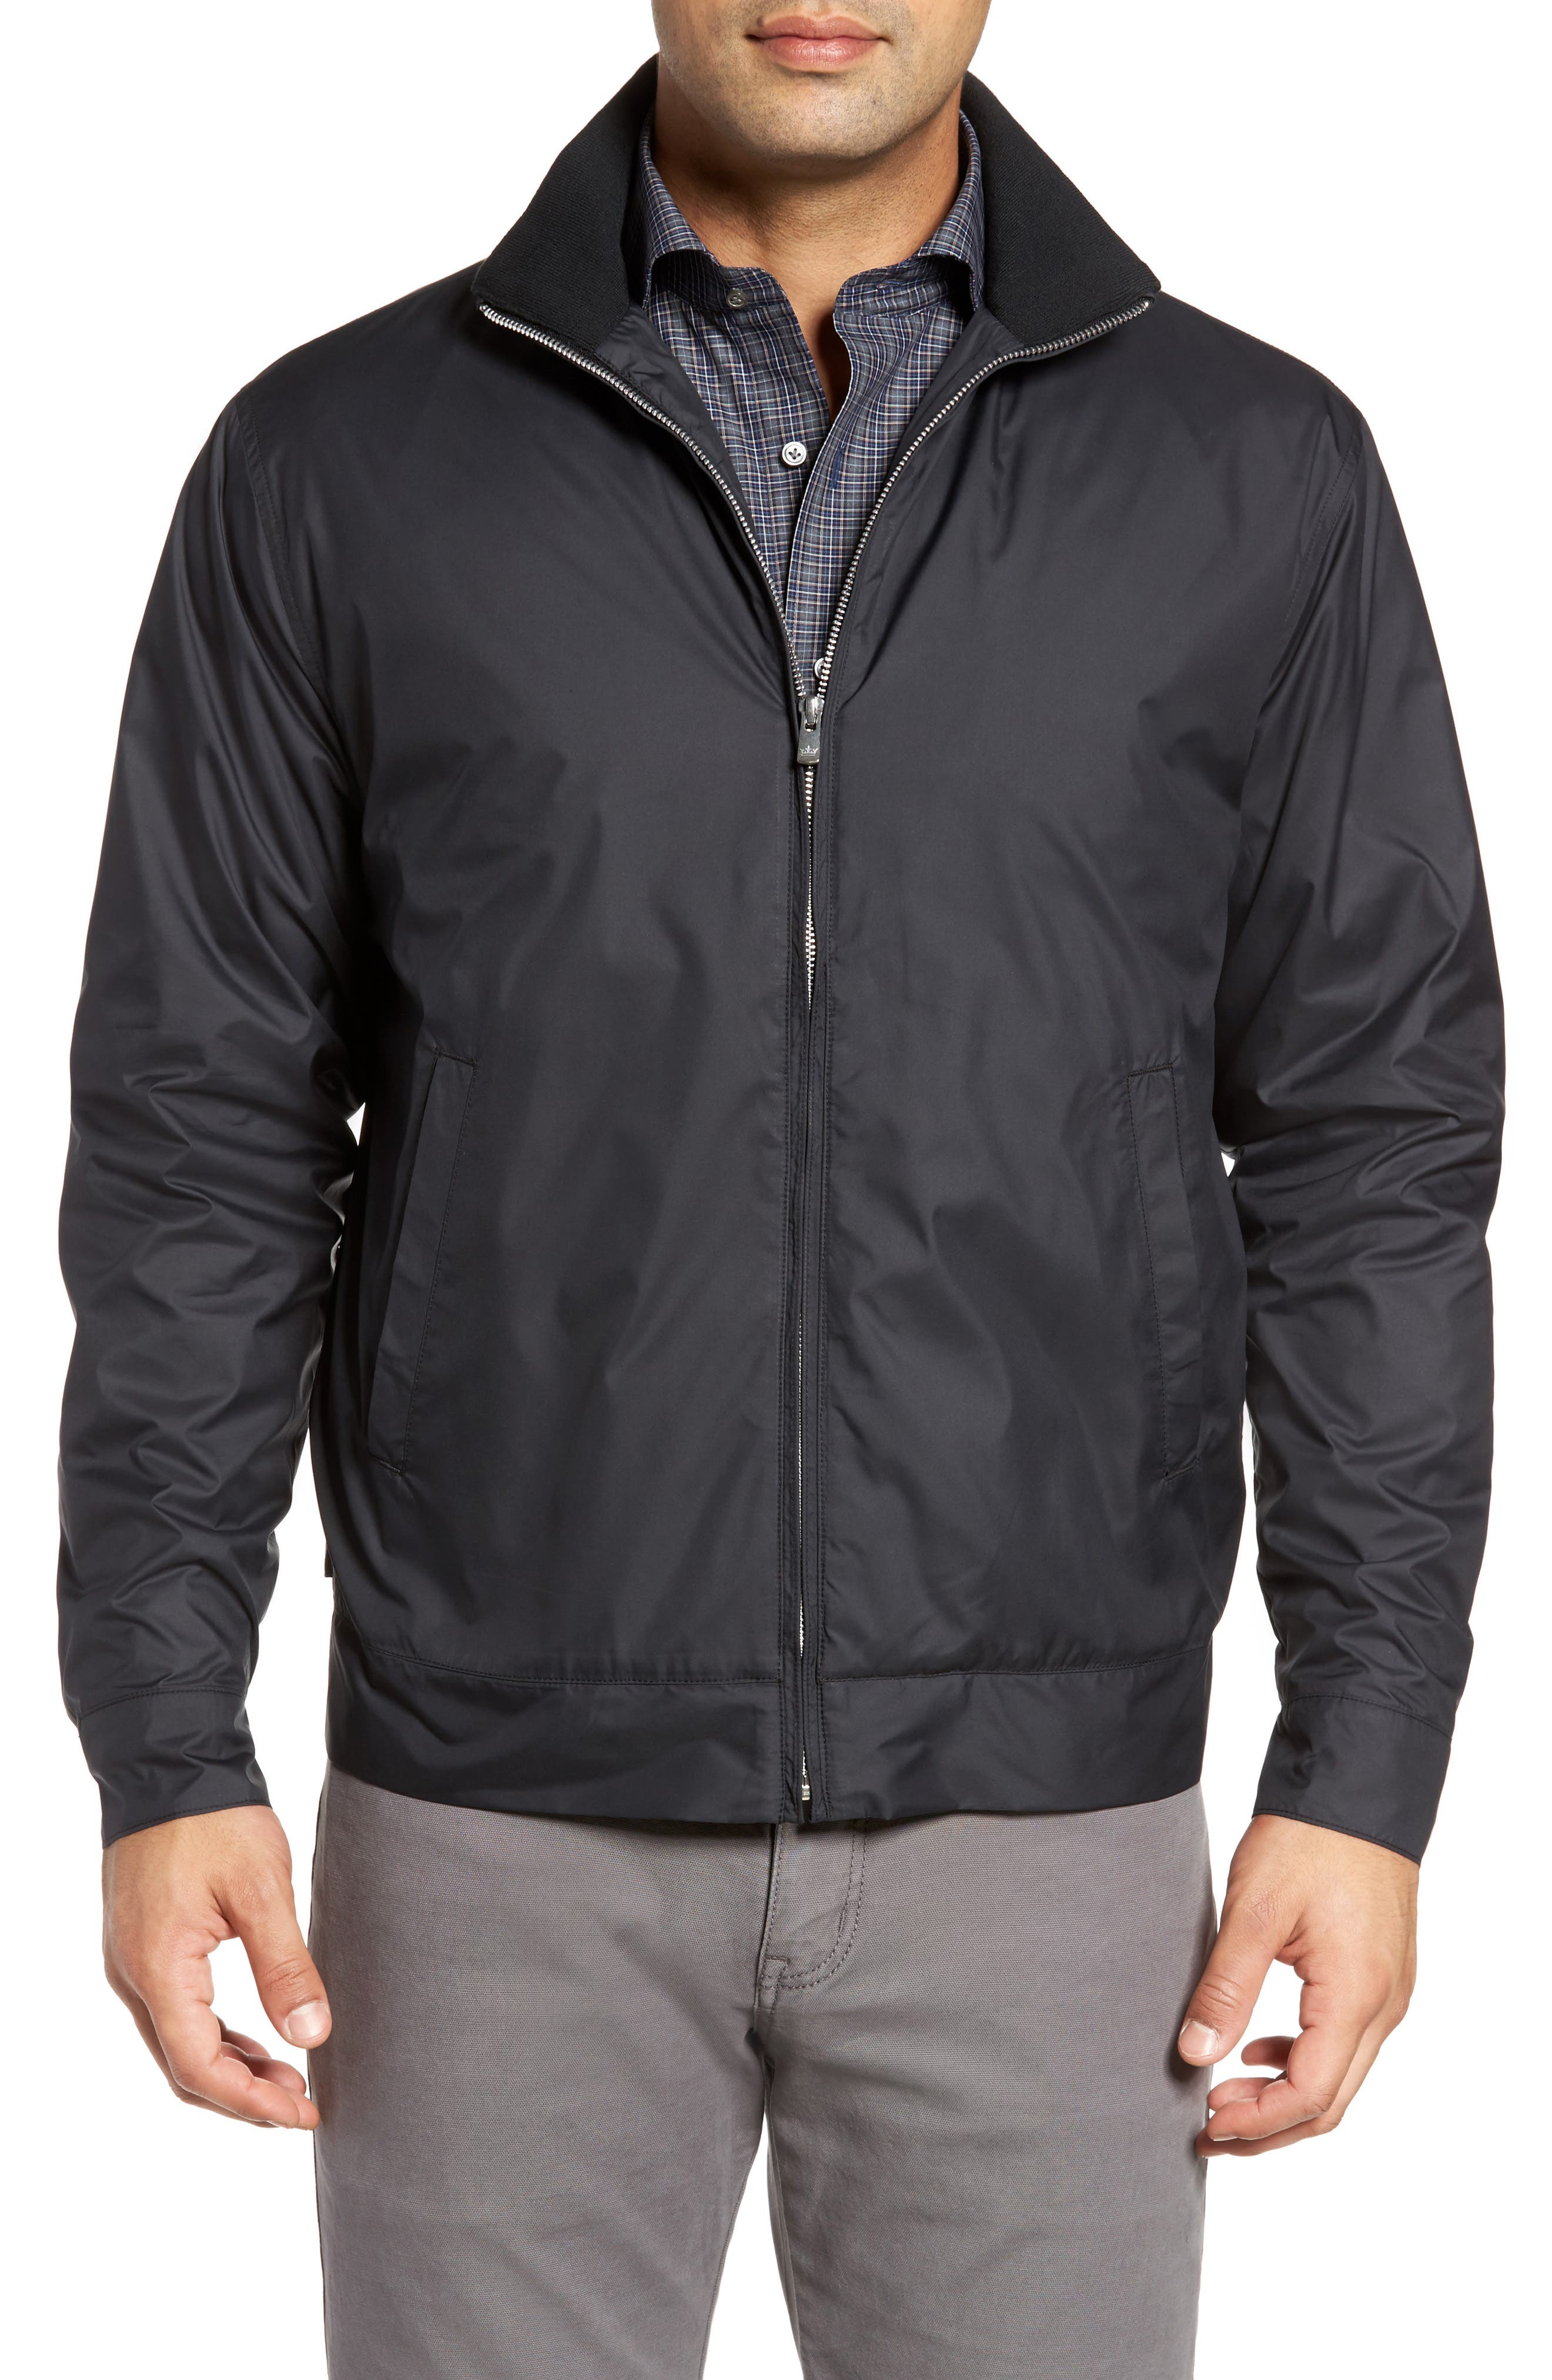 PETER MILLAR, Zip Jacket, Main thumbnail 1, color, BLACK